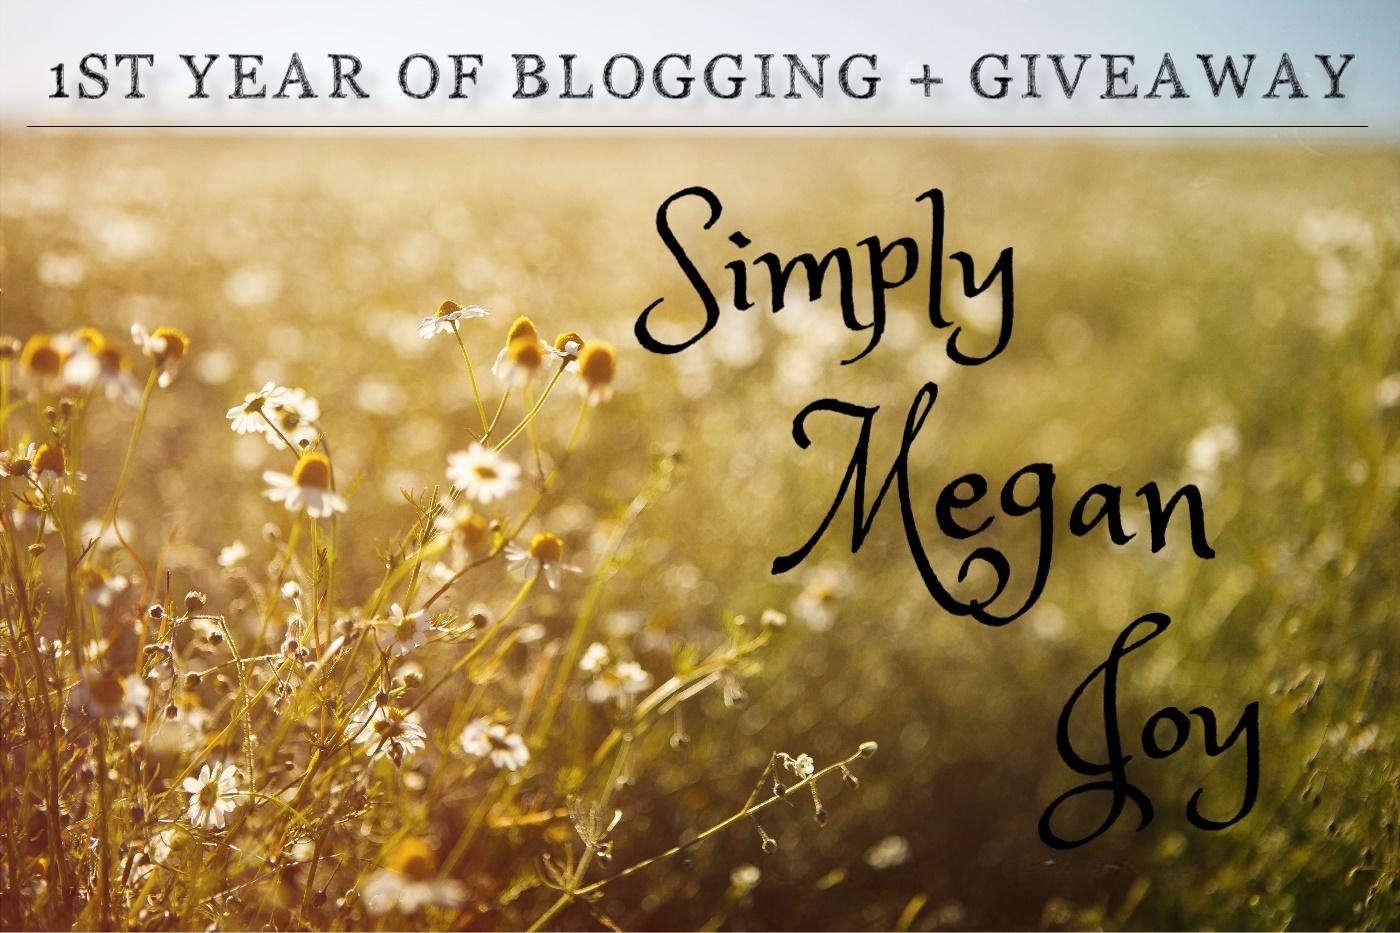 1st Year of Blogging + Giveaway - simplymeganjoy.wordpress.com 1